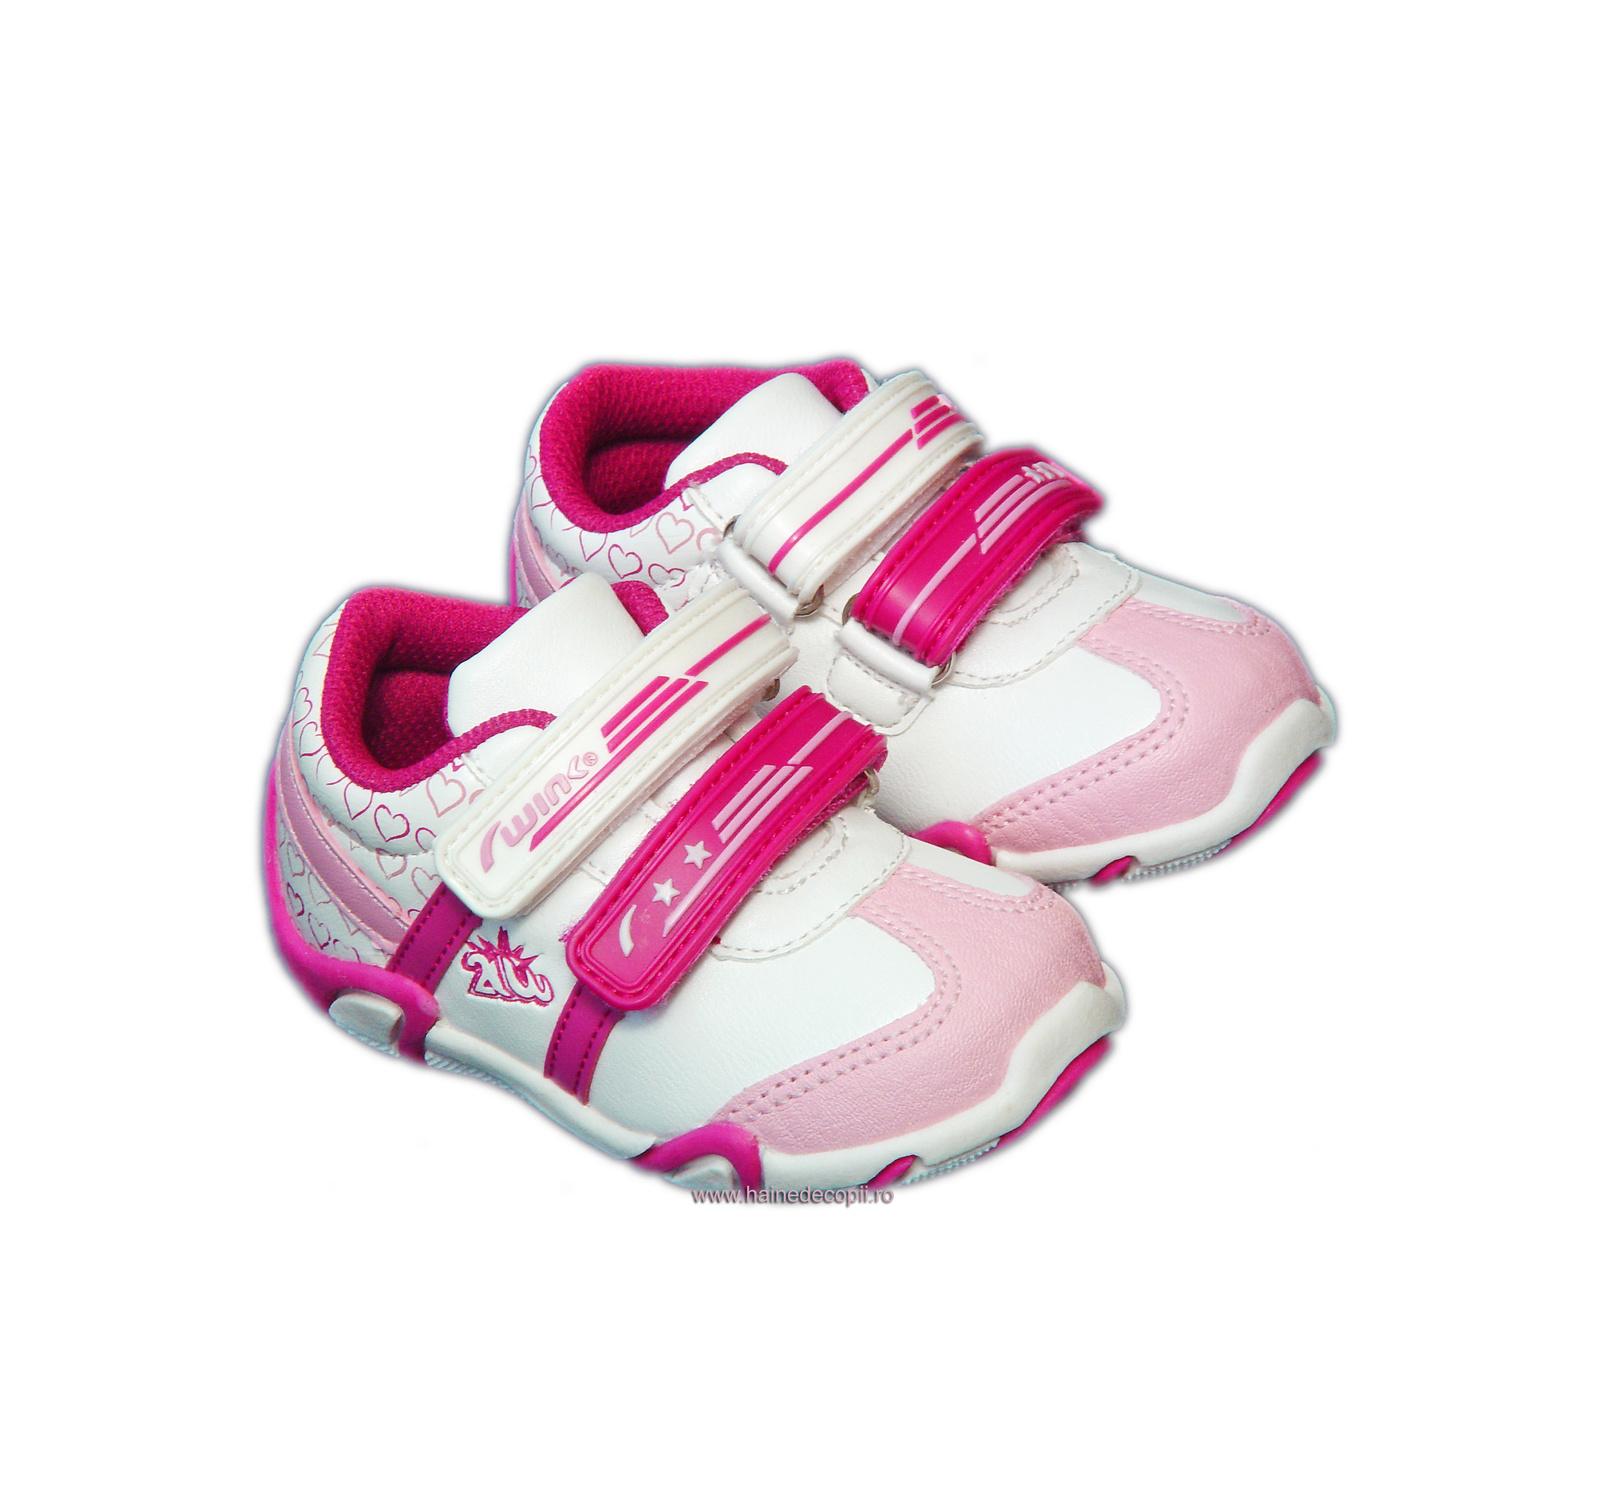 Pantof sport Wink Alb-roz